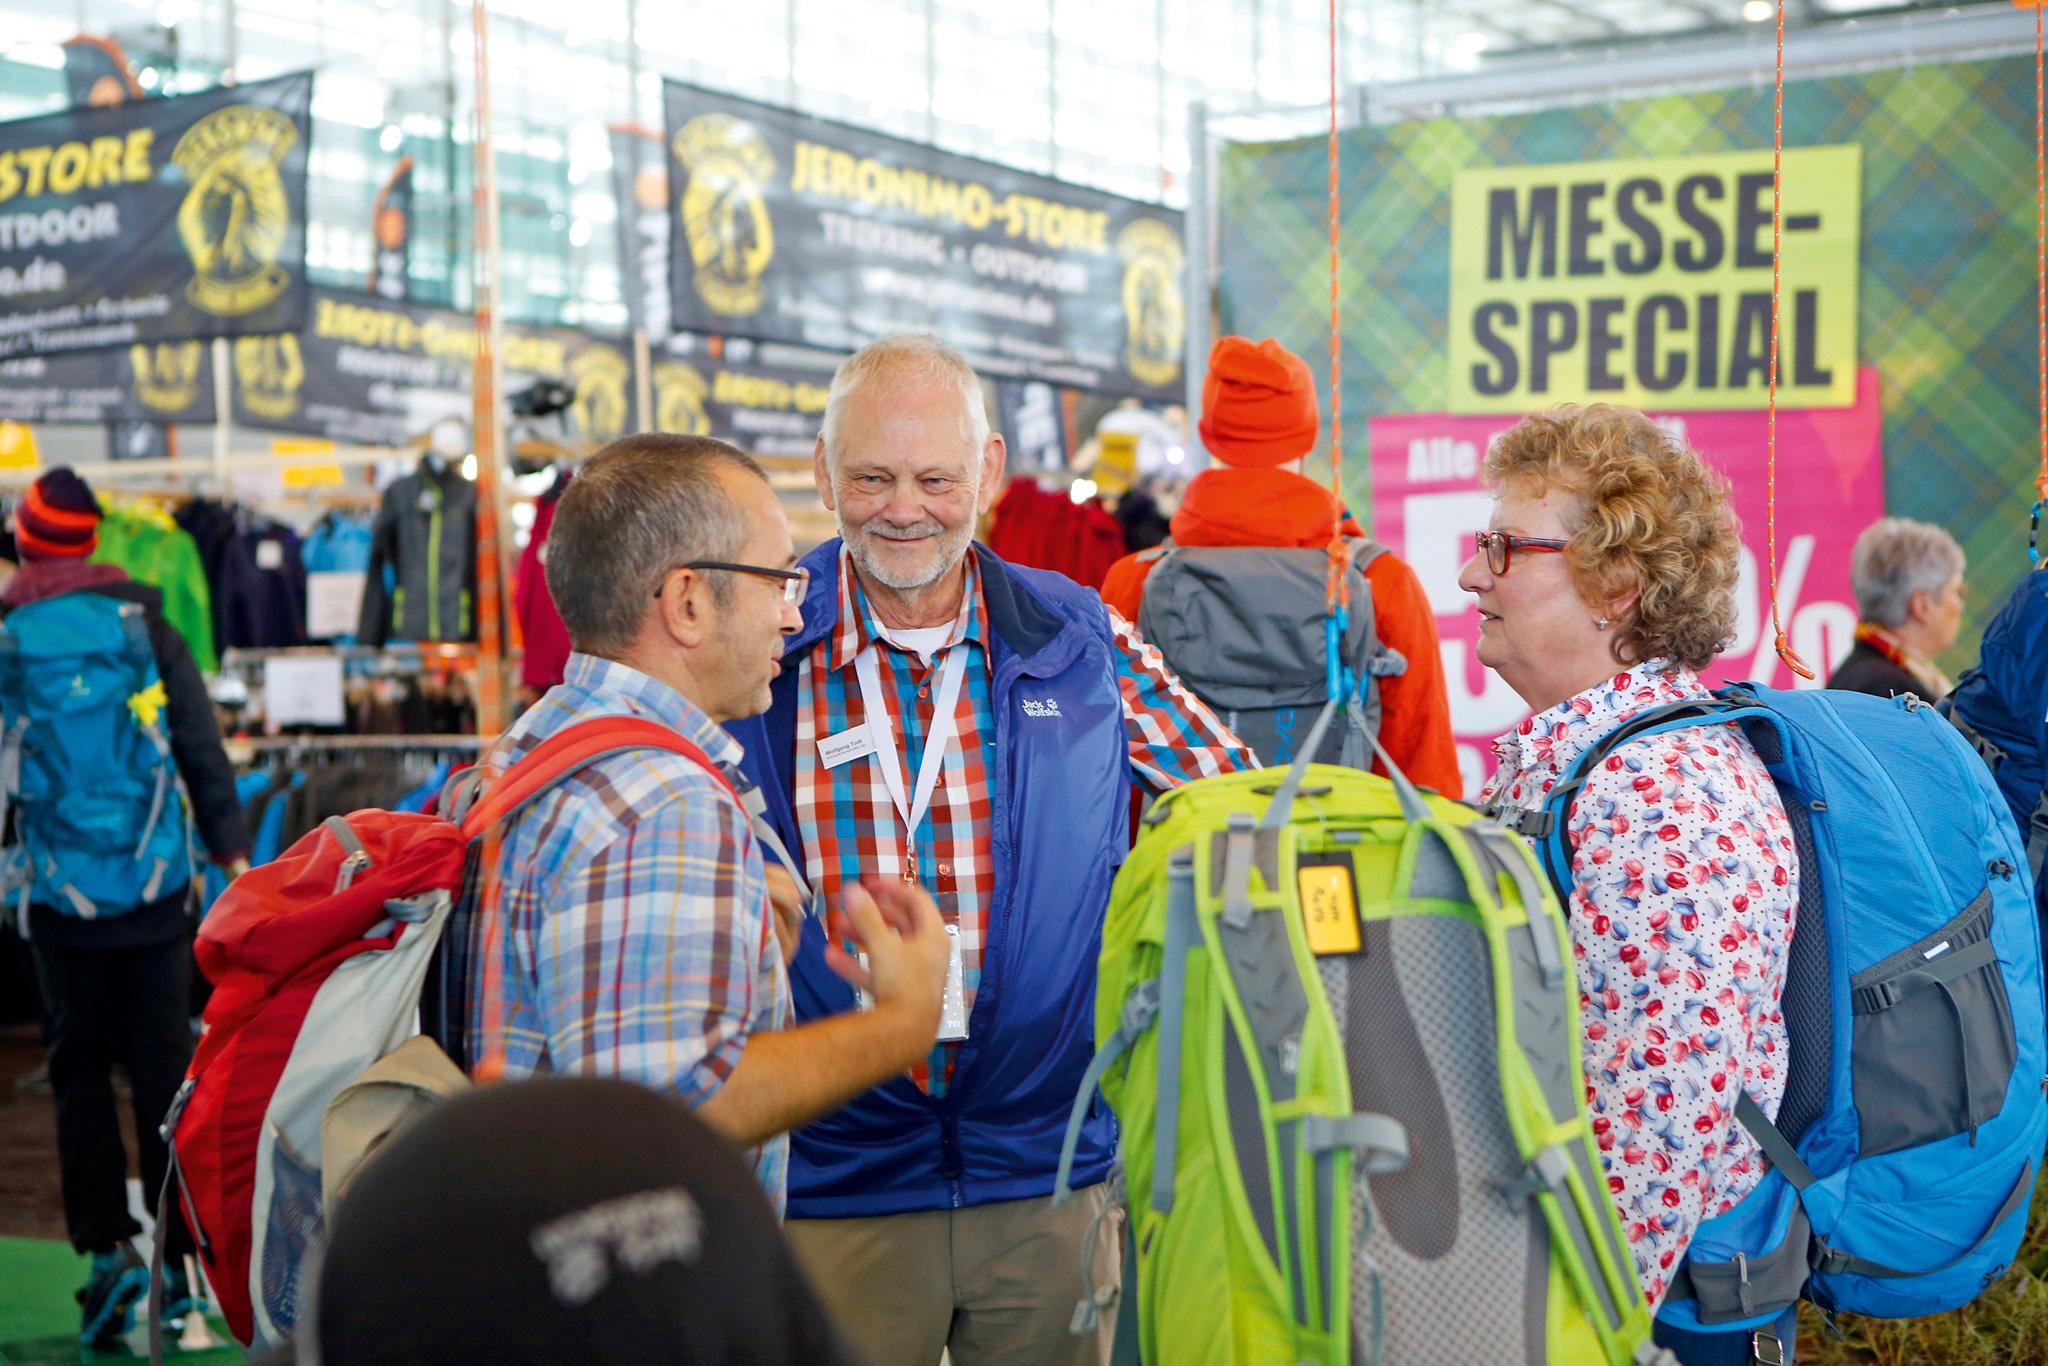 Wandermagazin-Experte Dr. Wolfgang Todt berät zum Thema Ausrüstung © Messe Düsseldorf